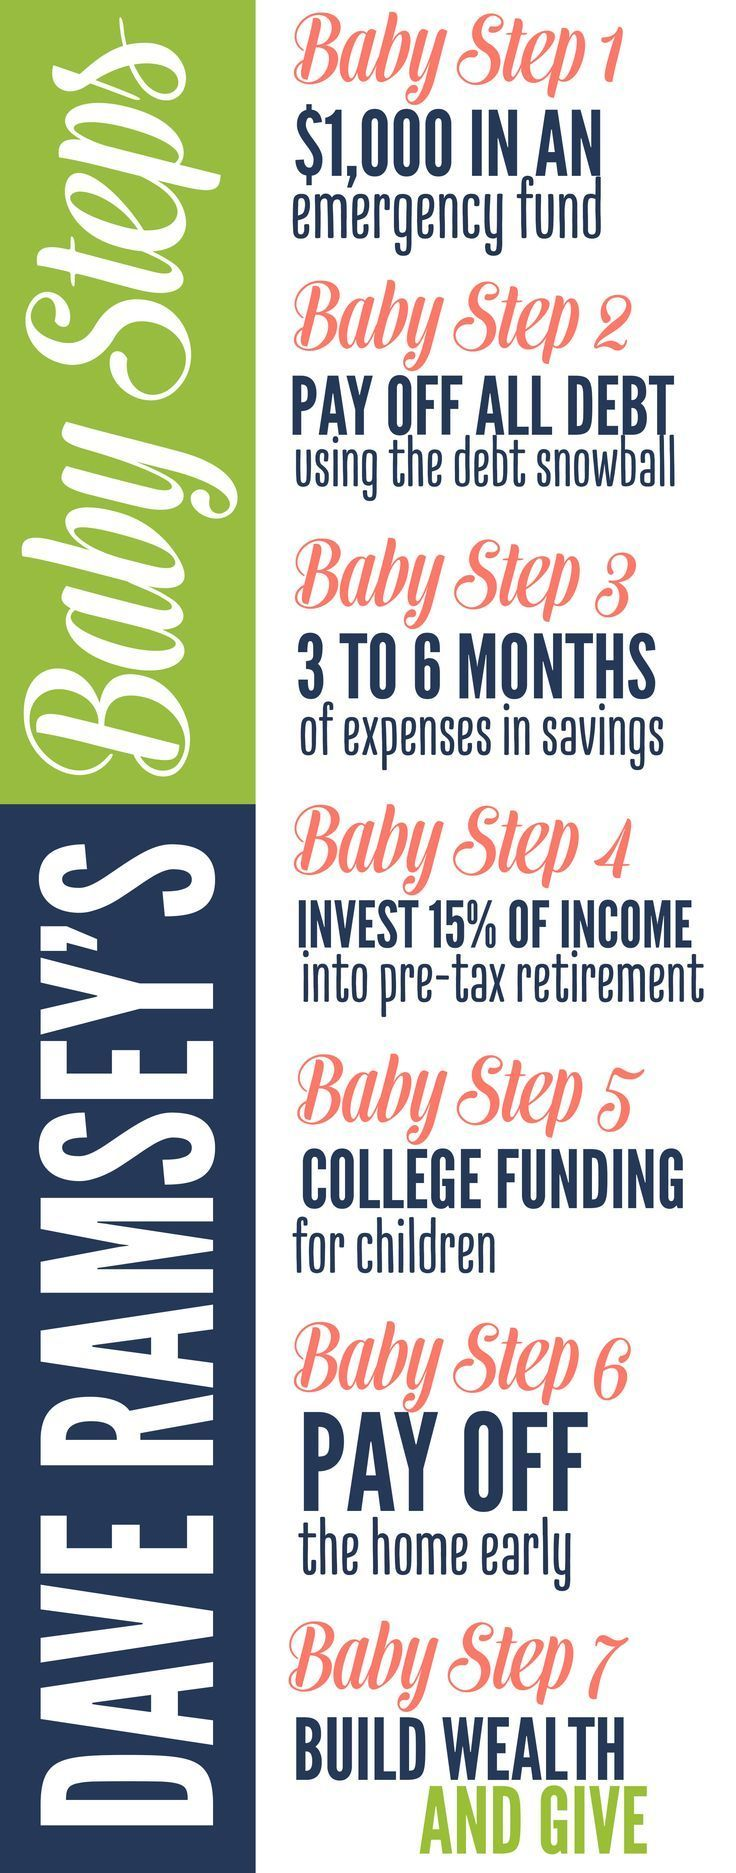 #ramseys #budget #after #going #steps #debt